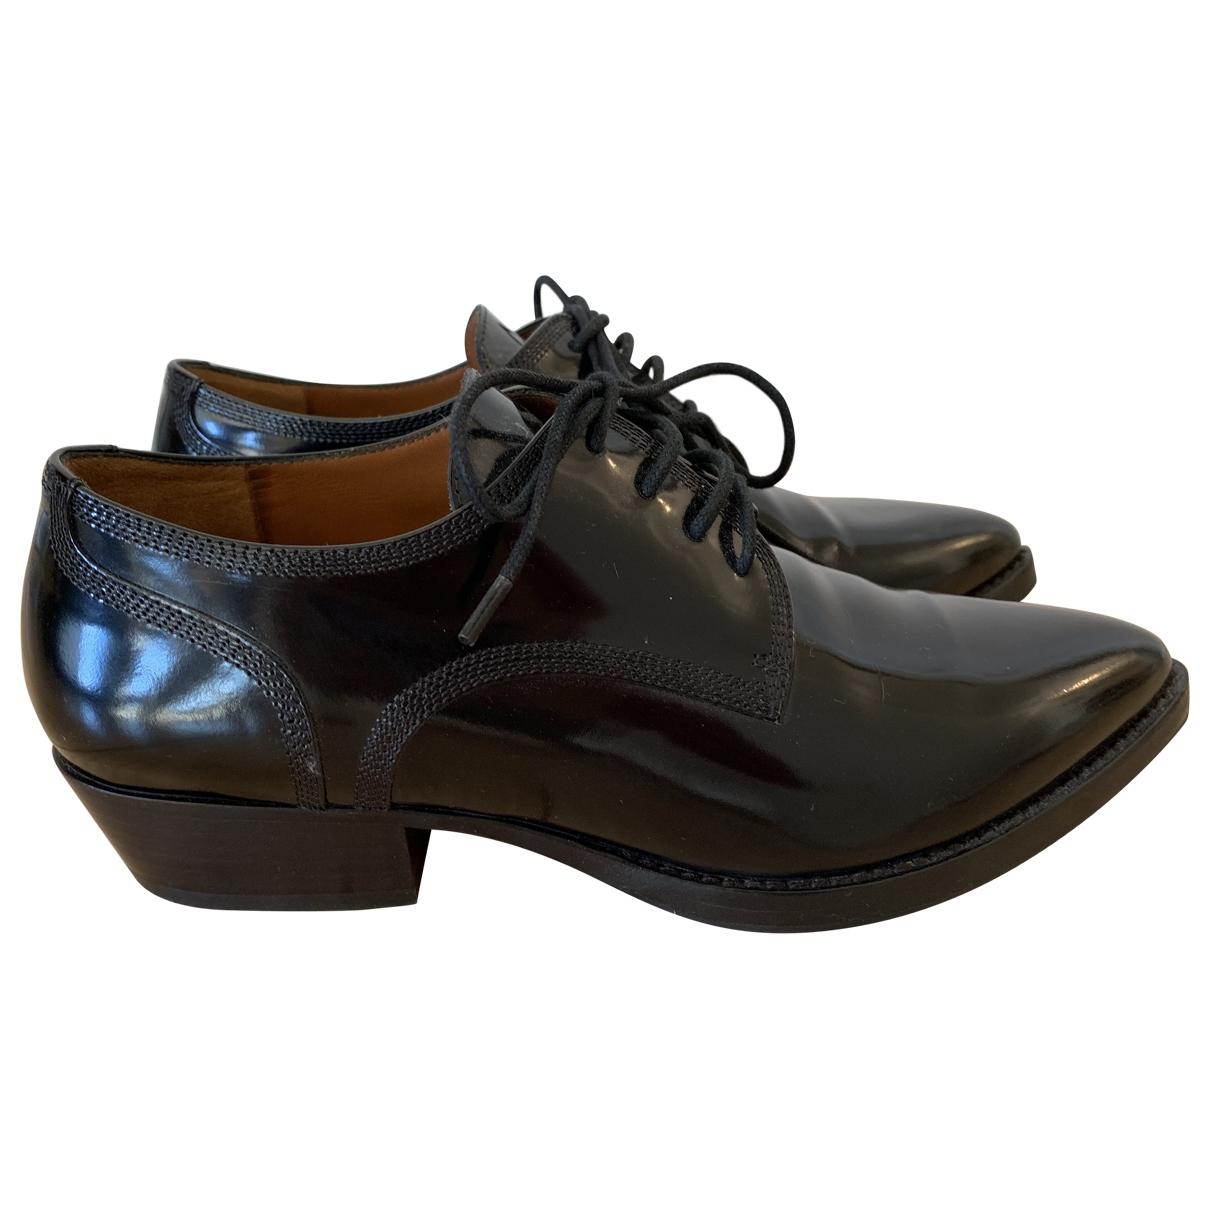 Valentino Garavani \N Black Patent leather Lace ups for Women 36 EU